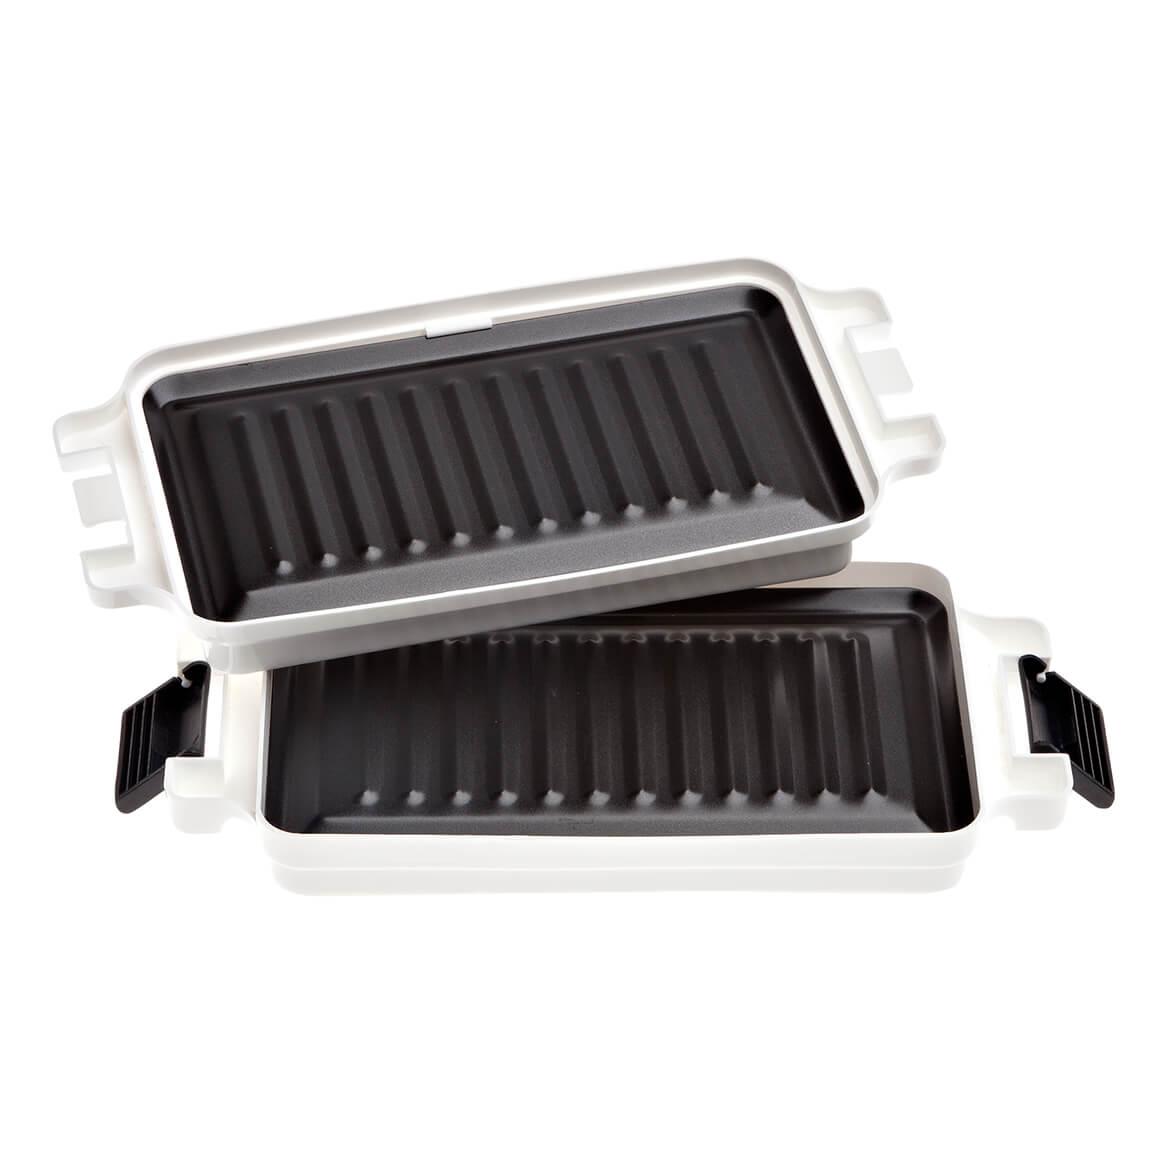 Microwave Griller-356467